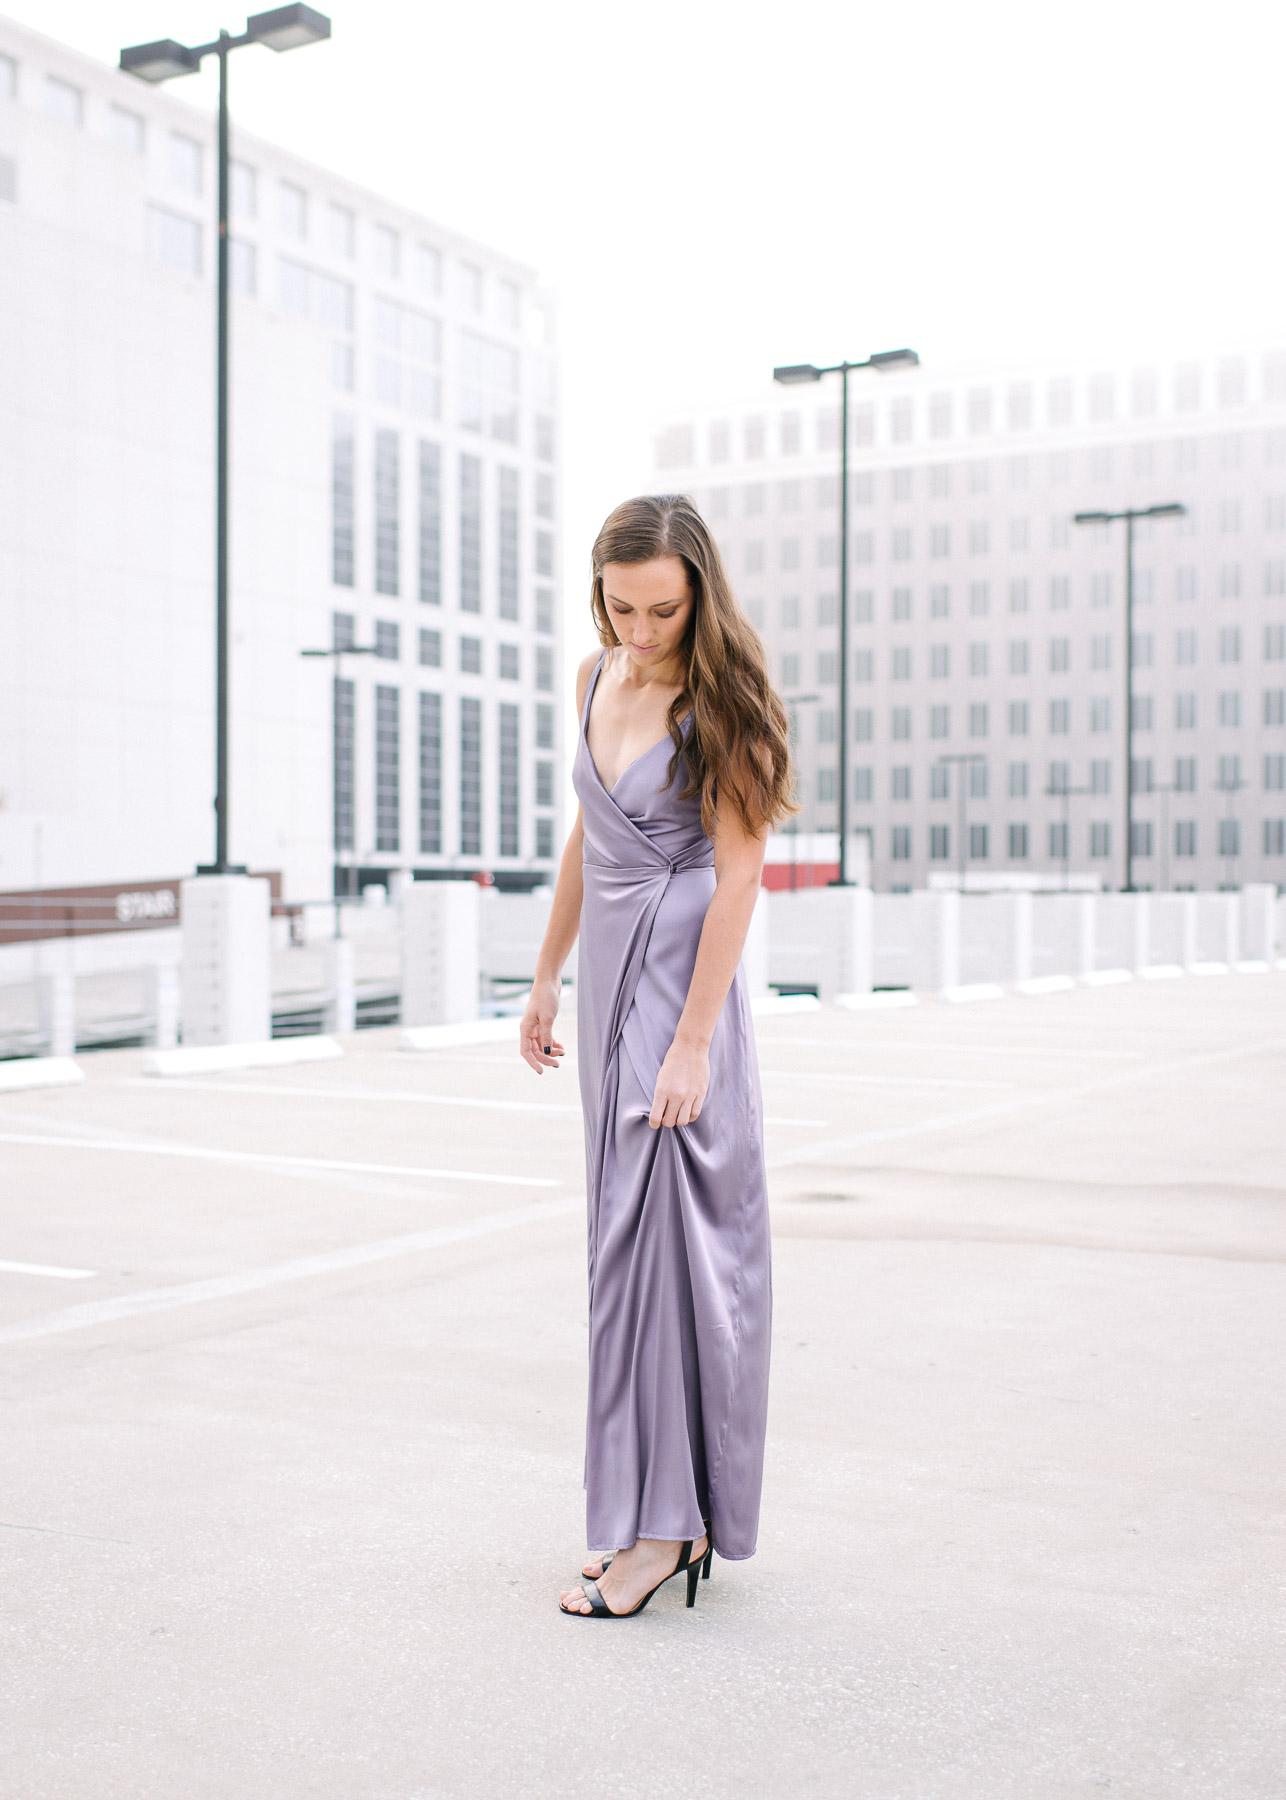 KateTaramykinStudios-Orlando-Fashion-Portraits-MID-7.jpg